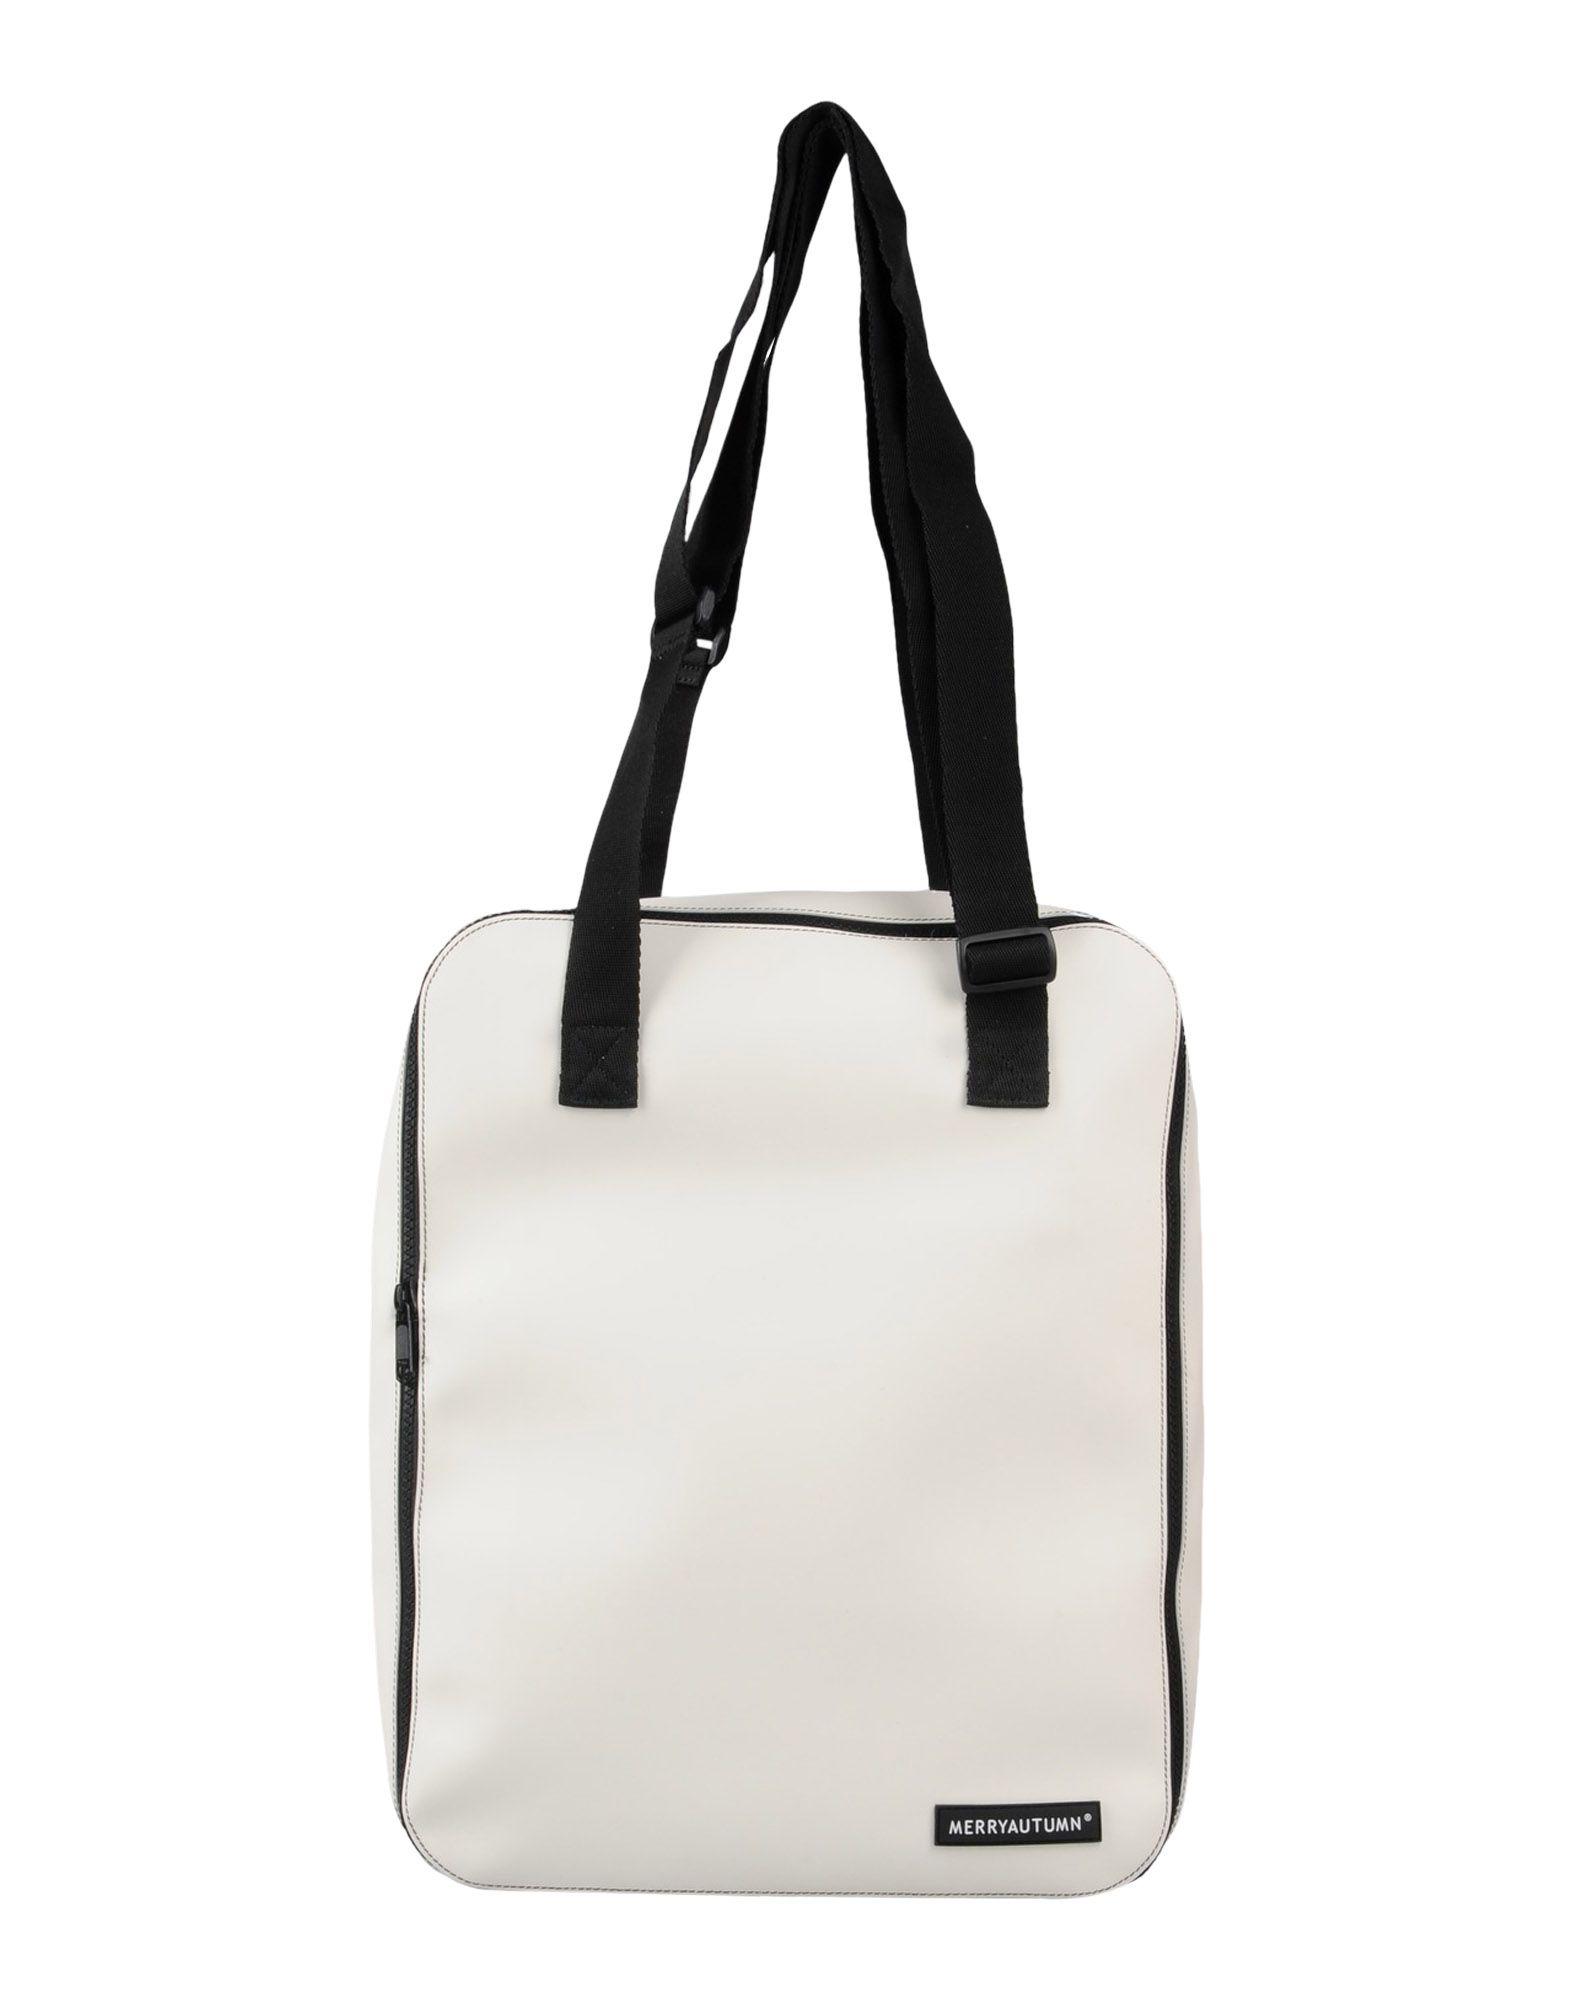 MERRY AUTUMN Сумка через плечо сумка через плечо anais gvani croco ag 1471 350161